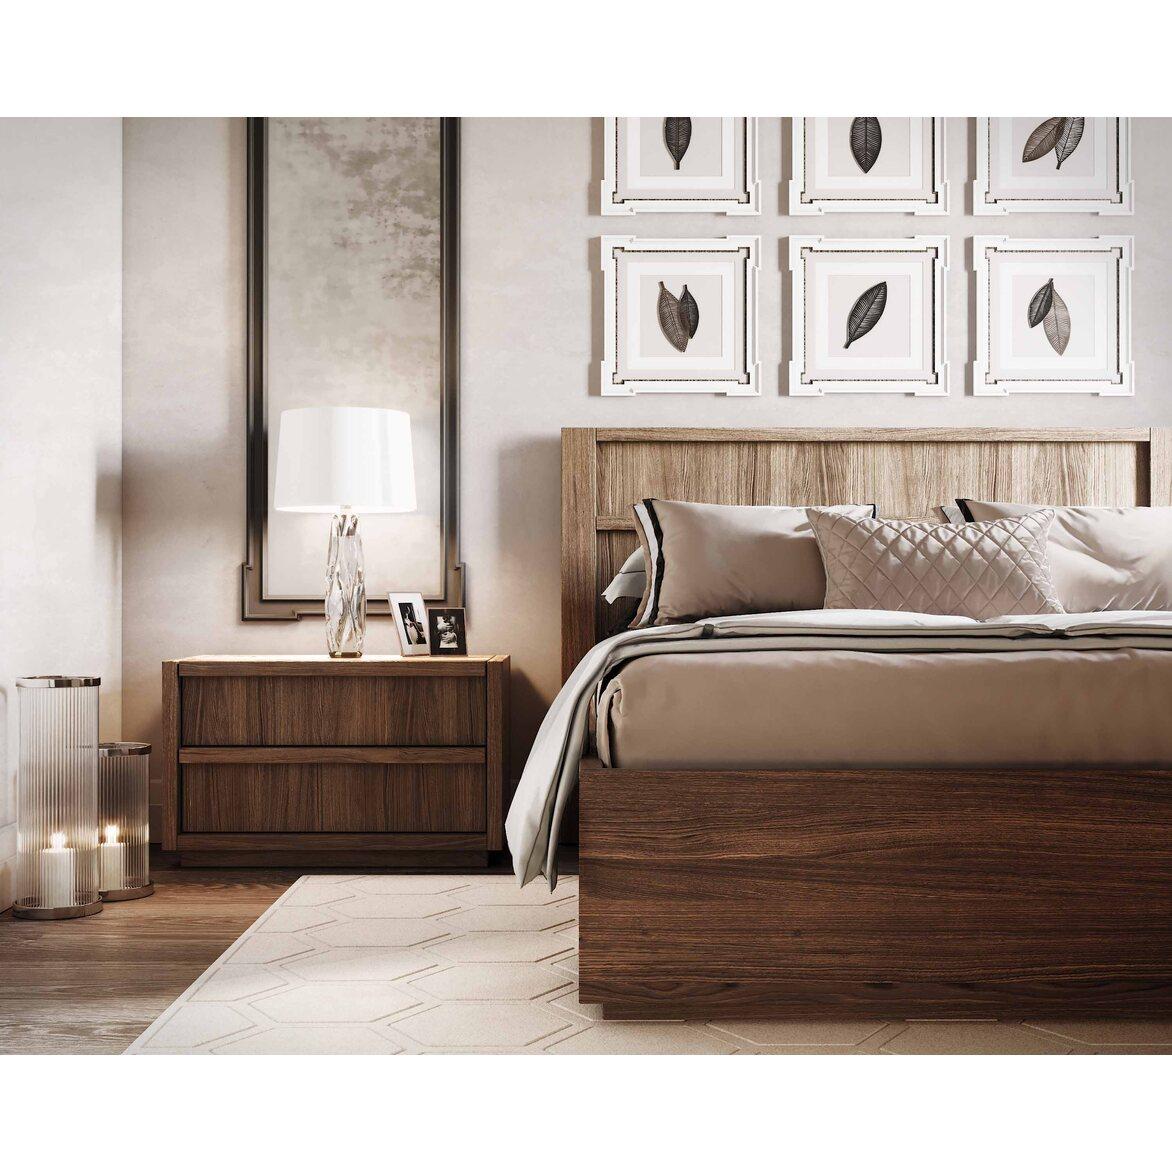 "Кровать 180*200 ""Brenson"" 7 | Двуспальные кровати Kingsby"